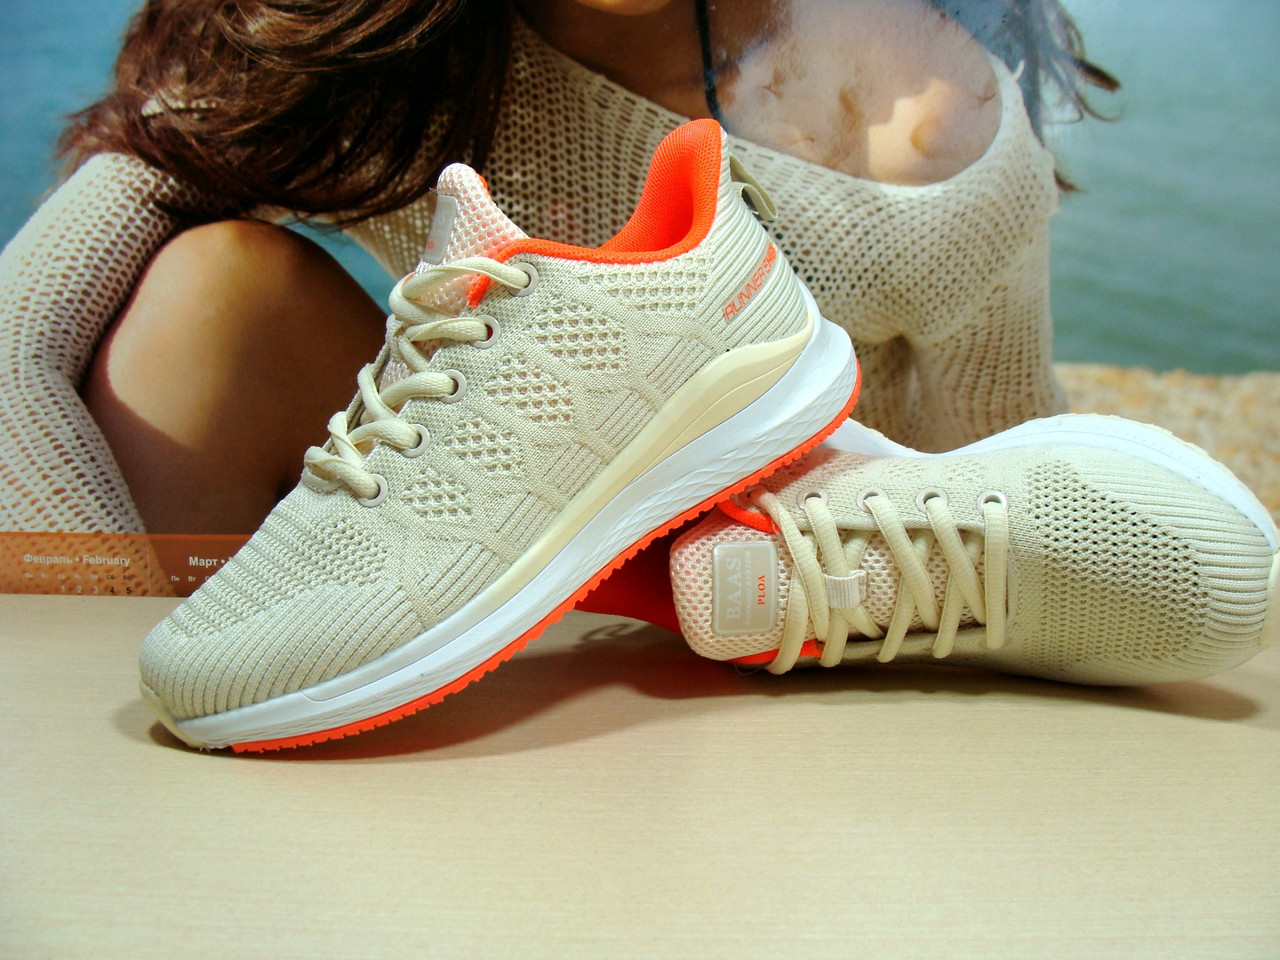 Кроссовки женские BaaS Runners бежевые 37 р.